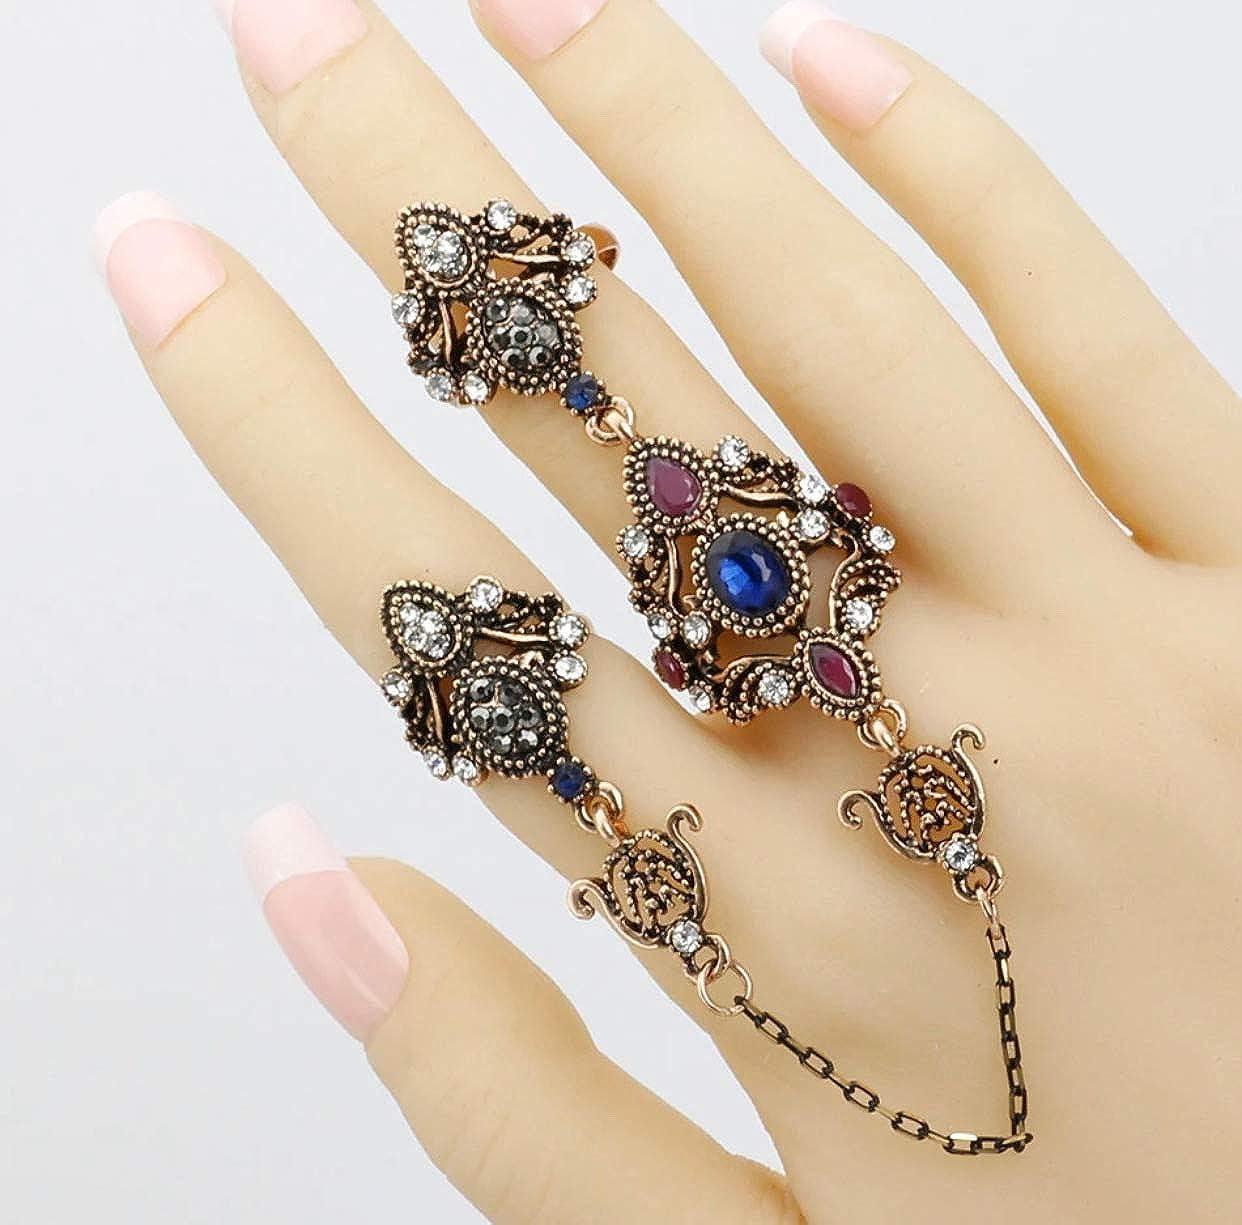 Adjustable vintage style resin owl ring